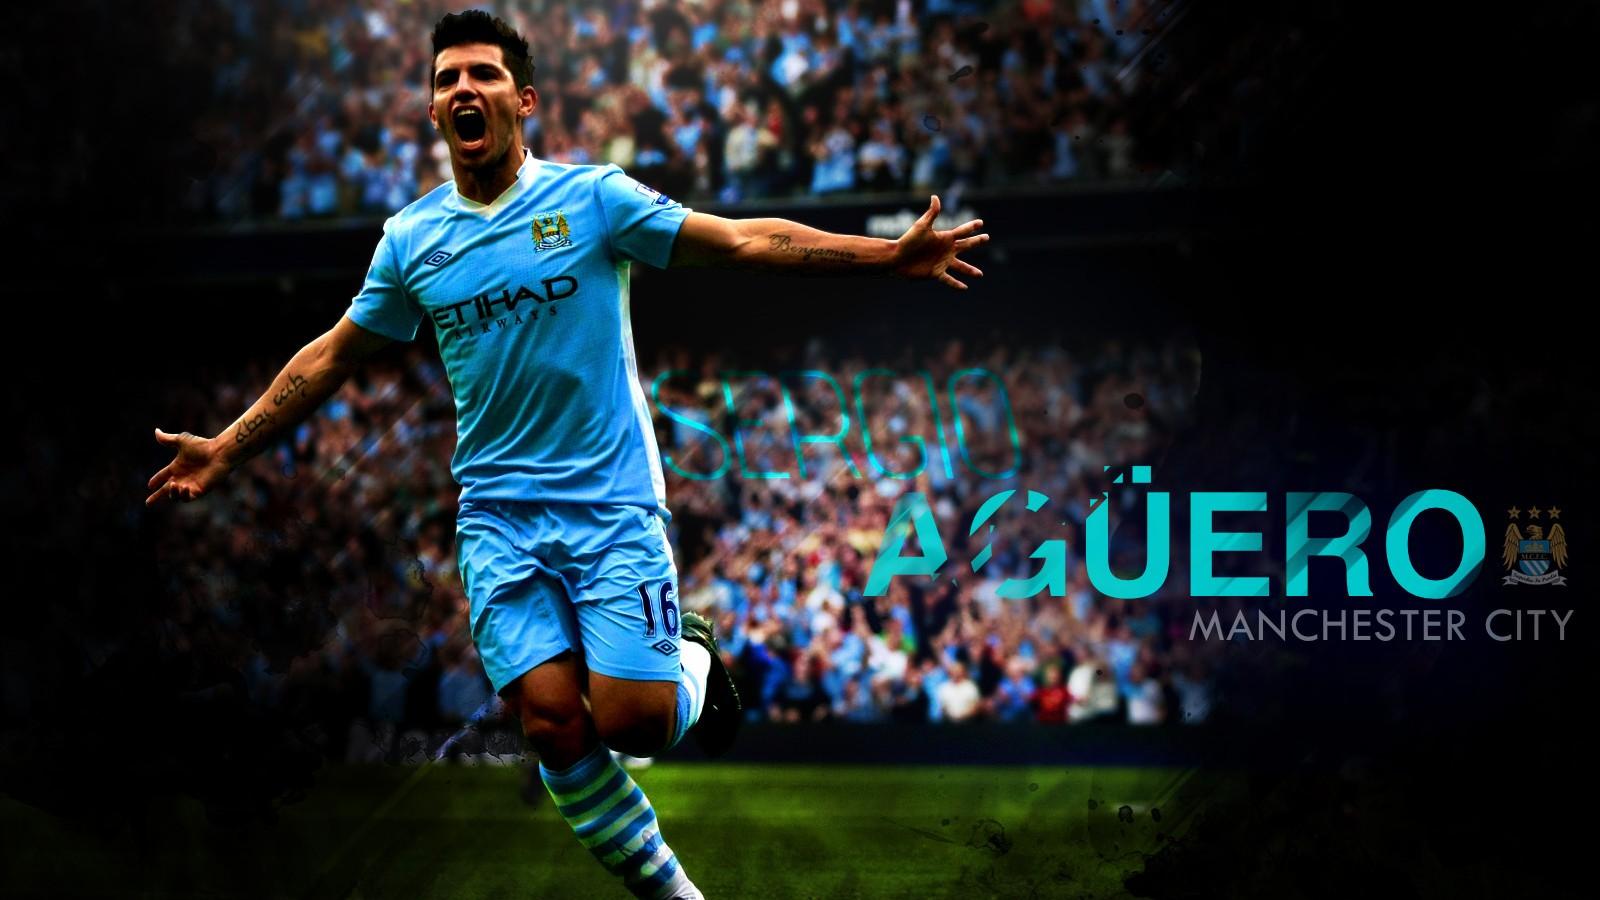 Sergio Aguero Manchester City Wallpaper Download 1600x900